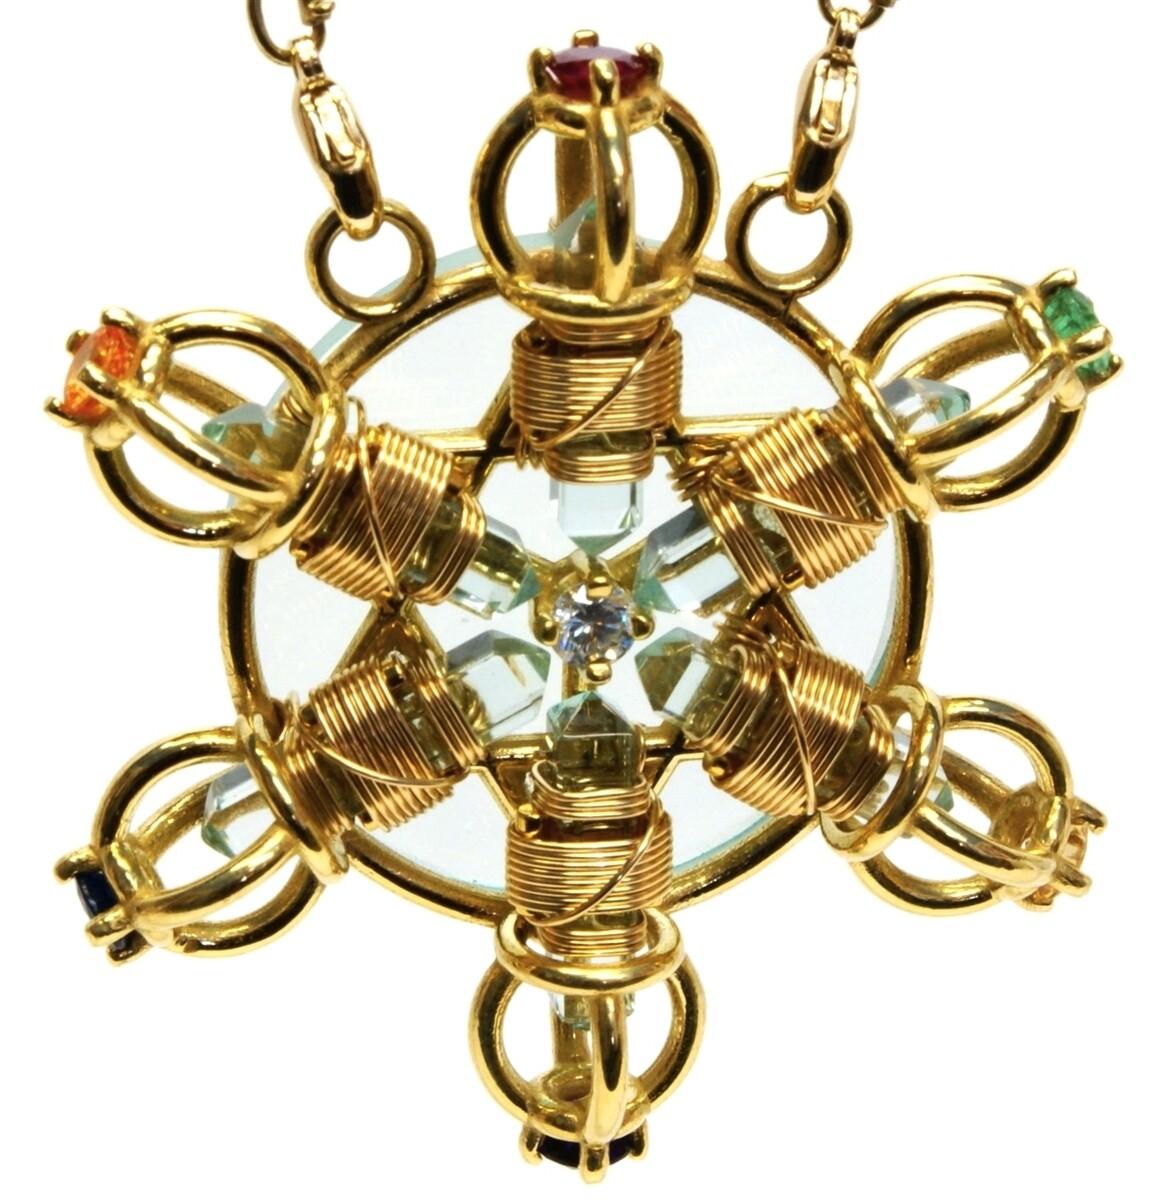 Buddha Maitreya the Christ 24K Gold-plated 7 Ray Shambhala Star Radiator with Semi-precious Stones